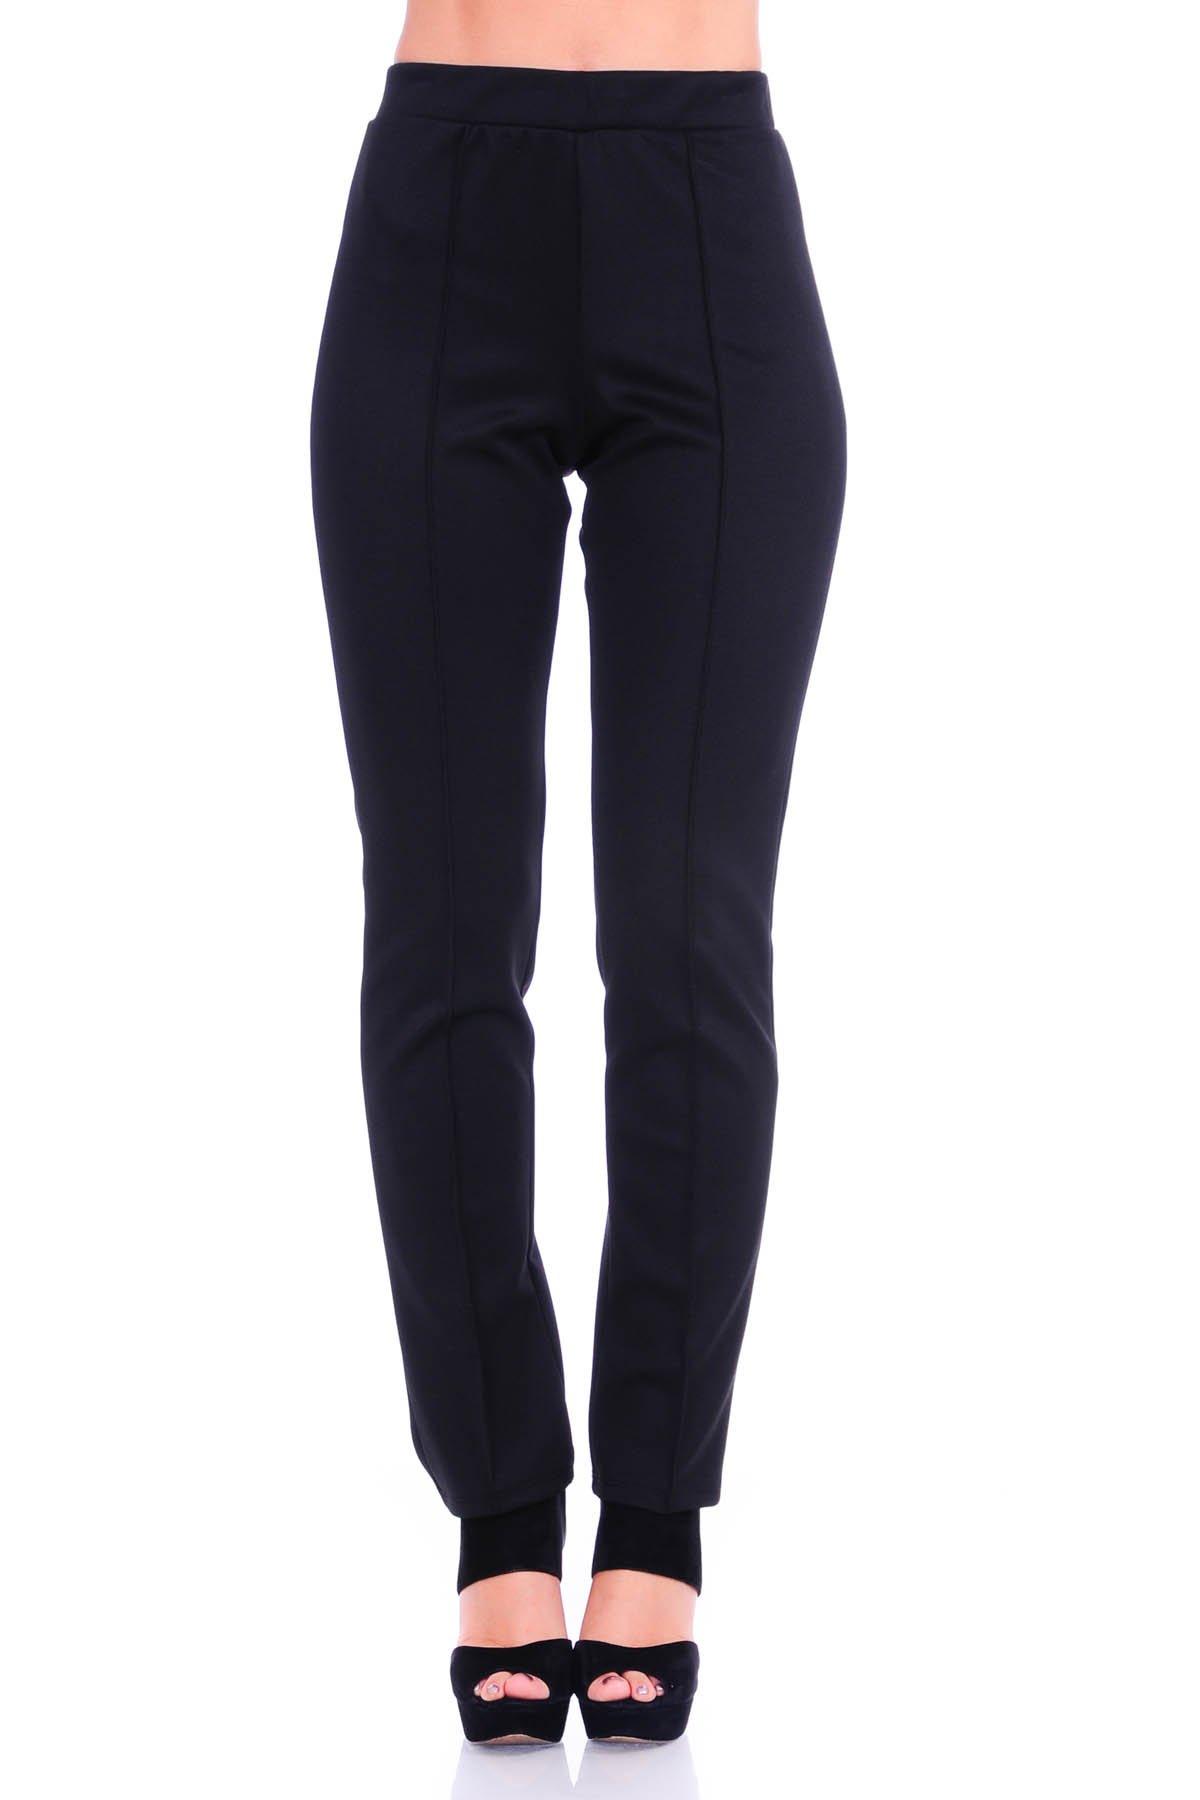 SR Women's Solid Stretch Straight Leg Slim Fit Pants, Large, Black